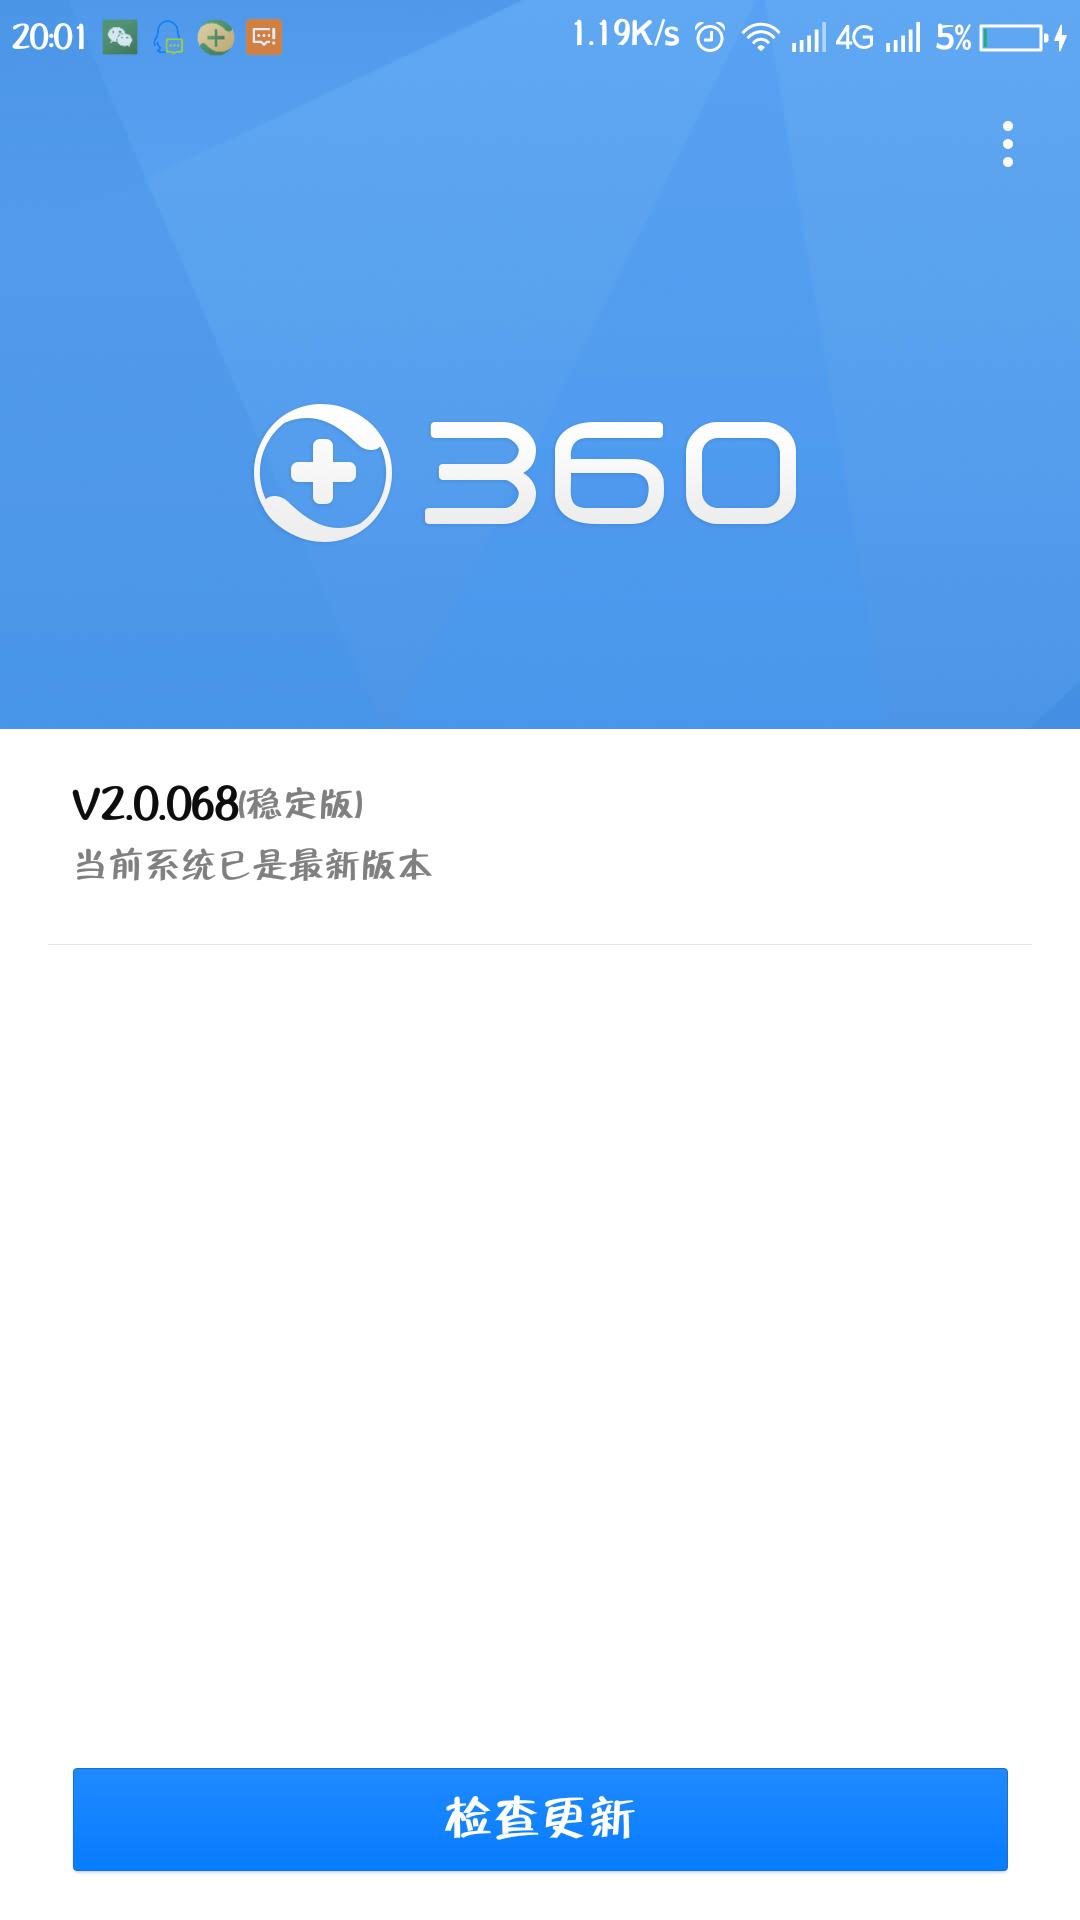 Screenshot_2016-08-31-20-01-06.png